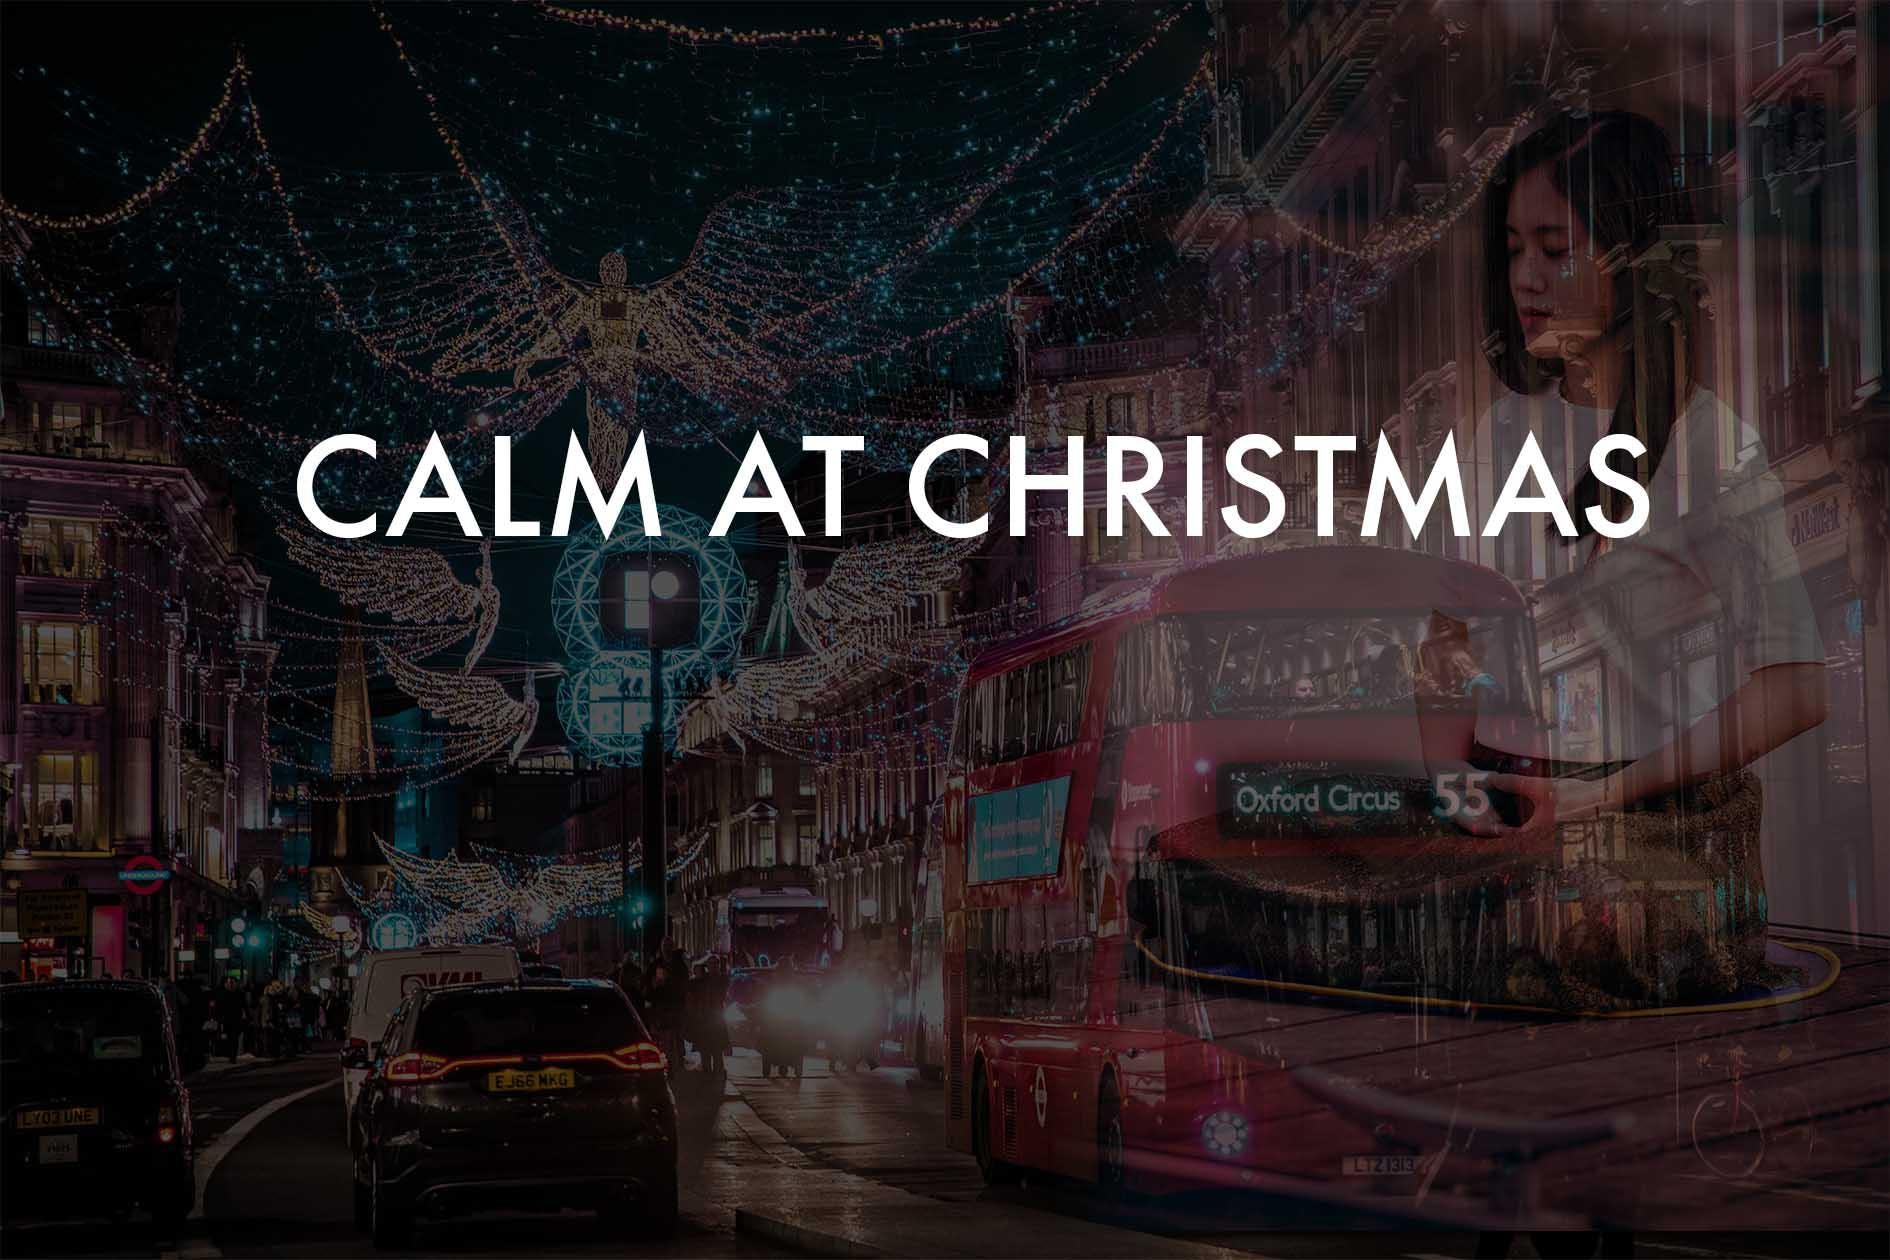 Calm at Christmas - Mindfulness Workshop